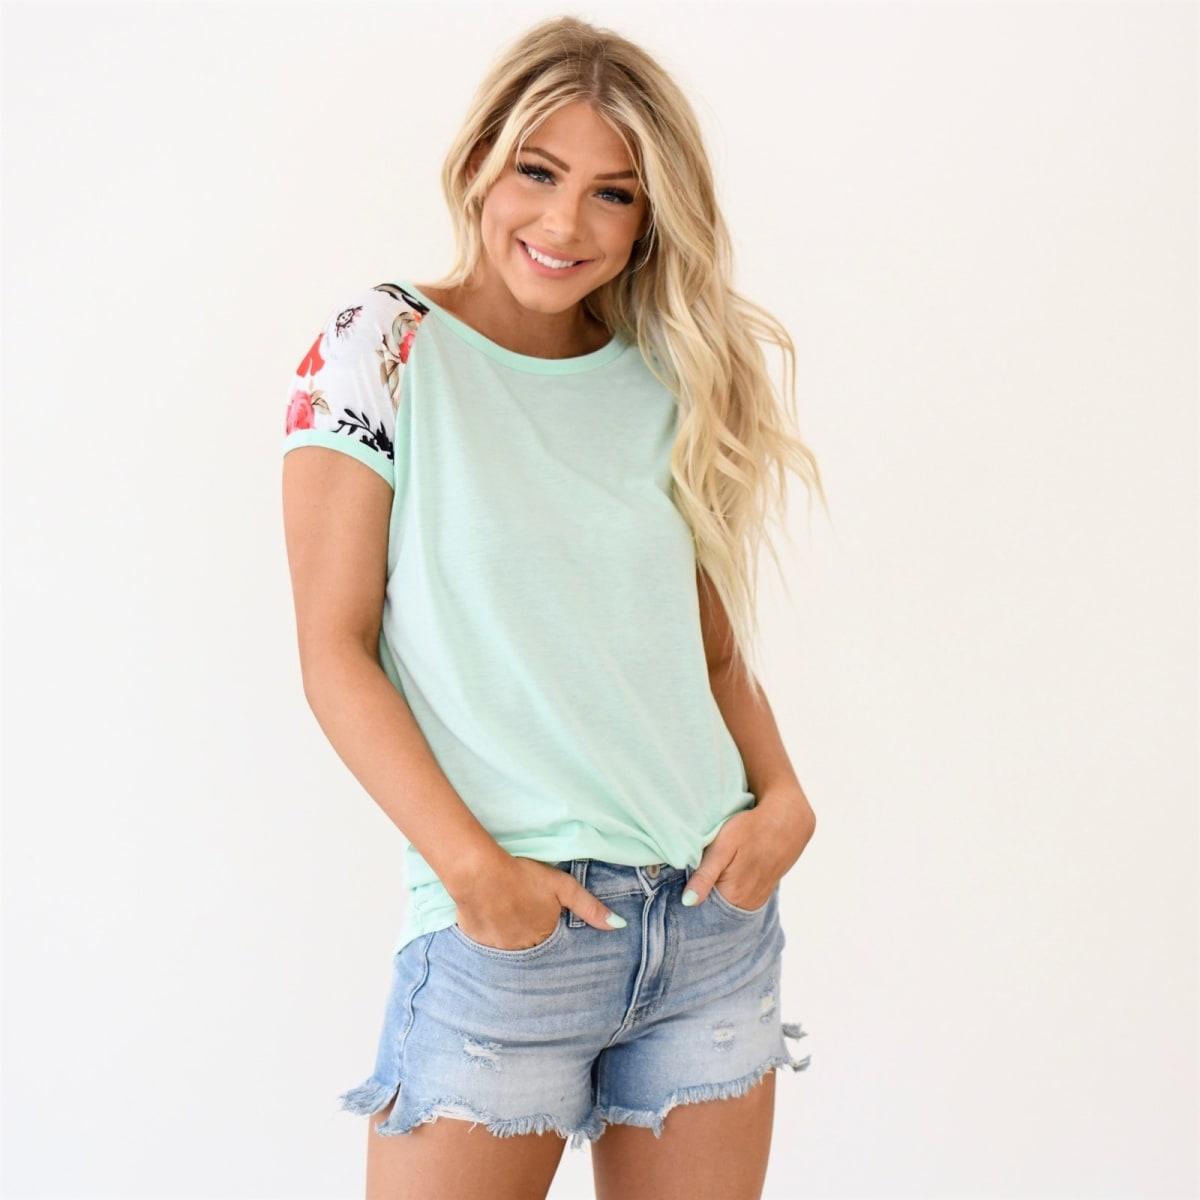 Janie Floral Sleeve Top- So pretty!